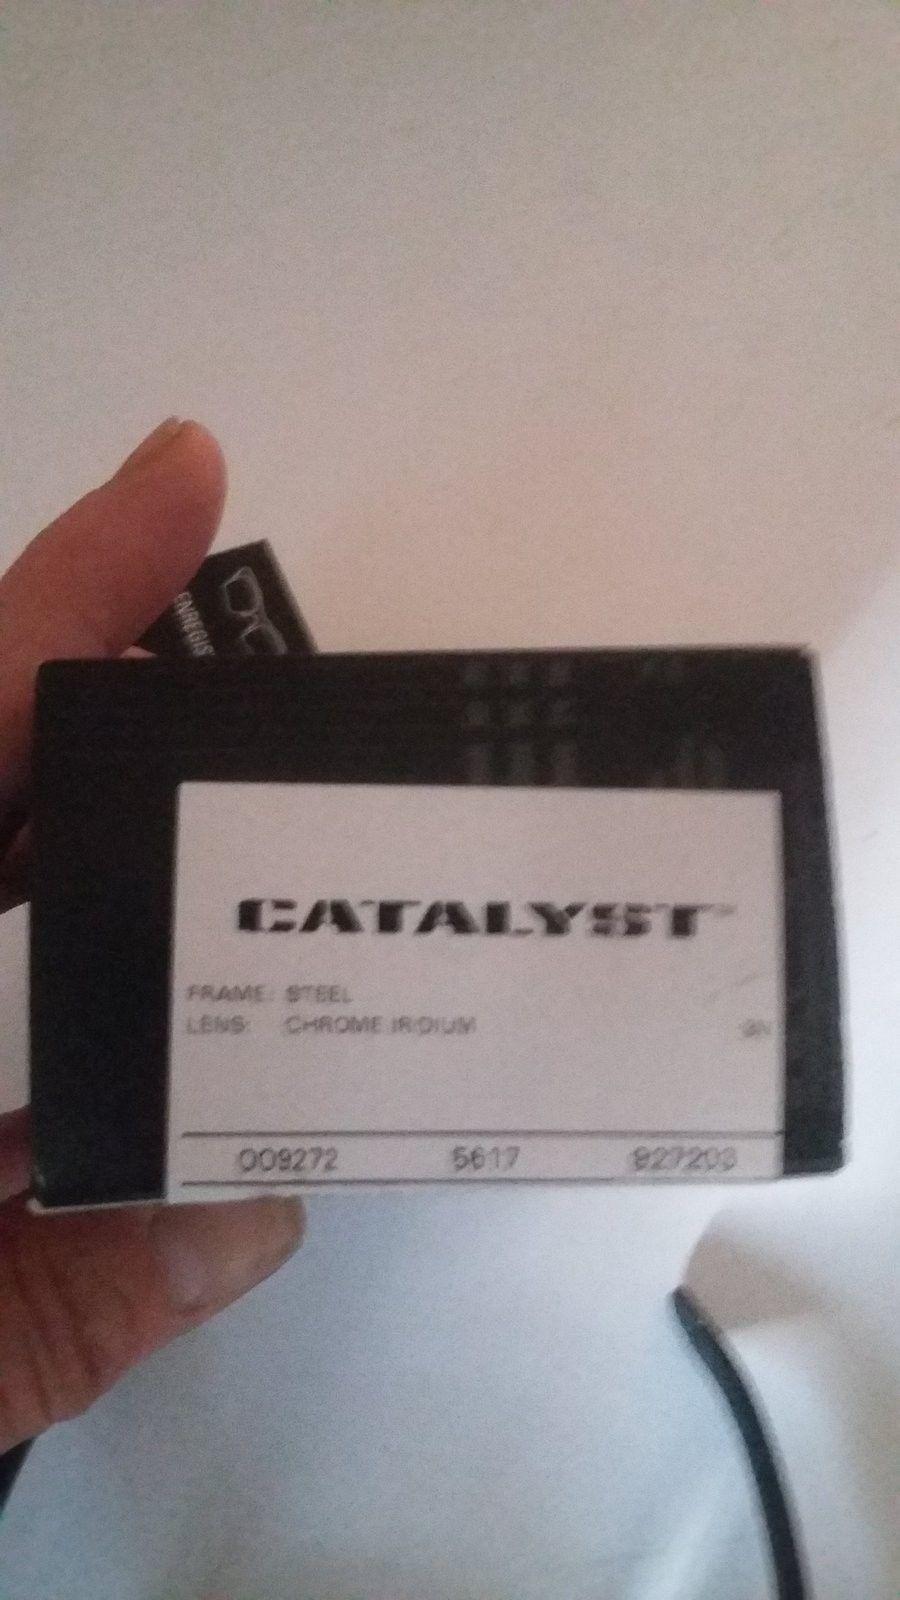 Catalyst Steele w/chrome iridium - 20151231_153746.jpg